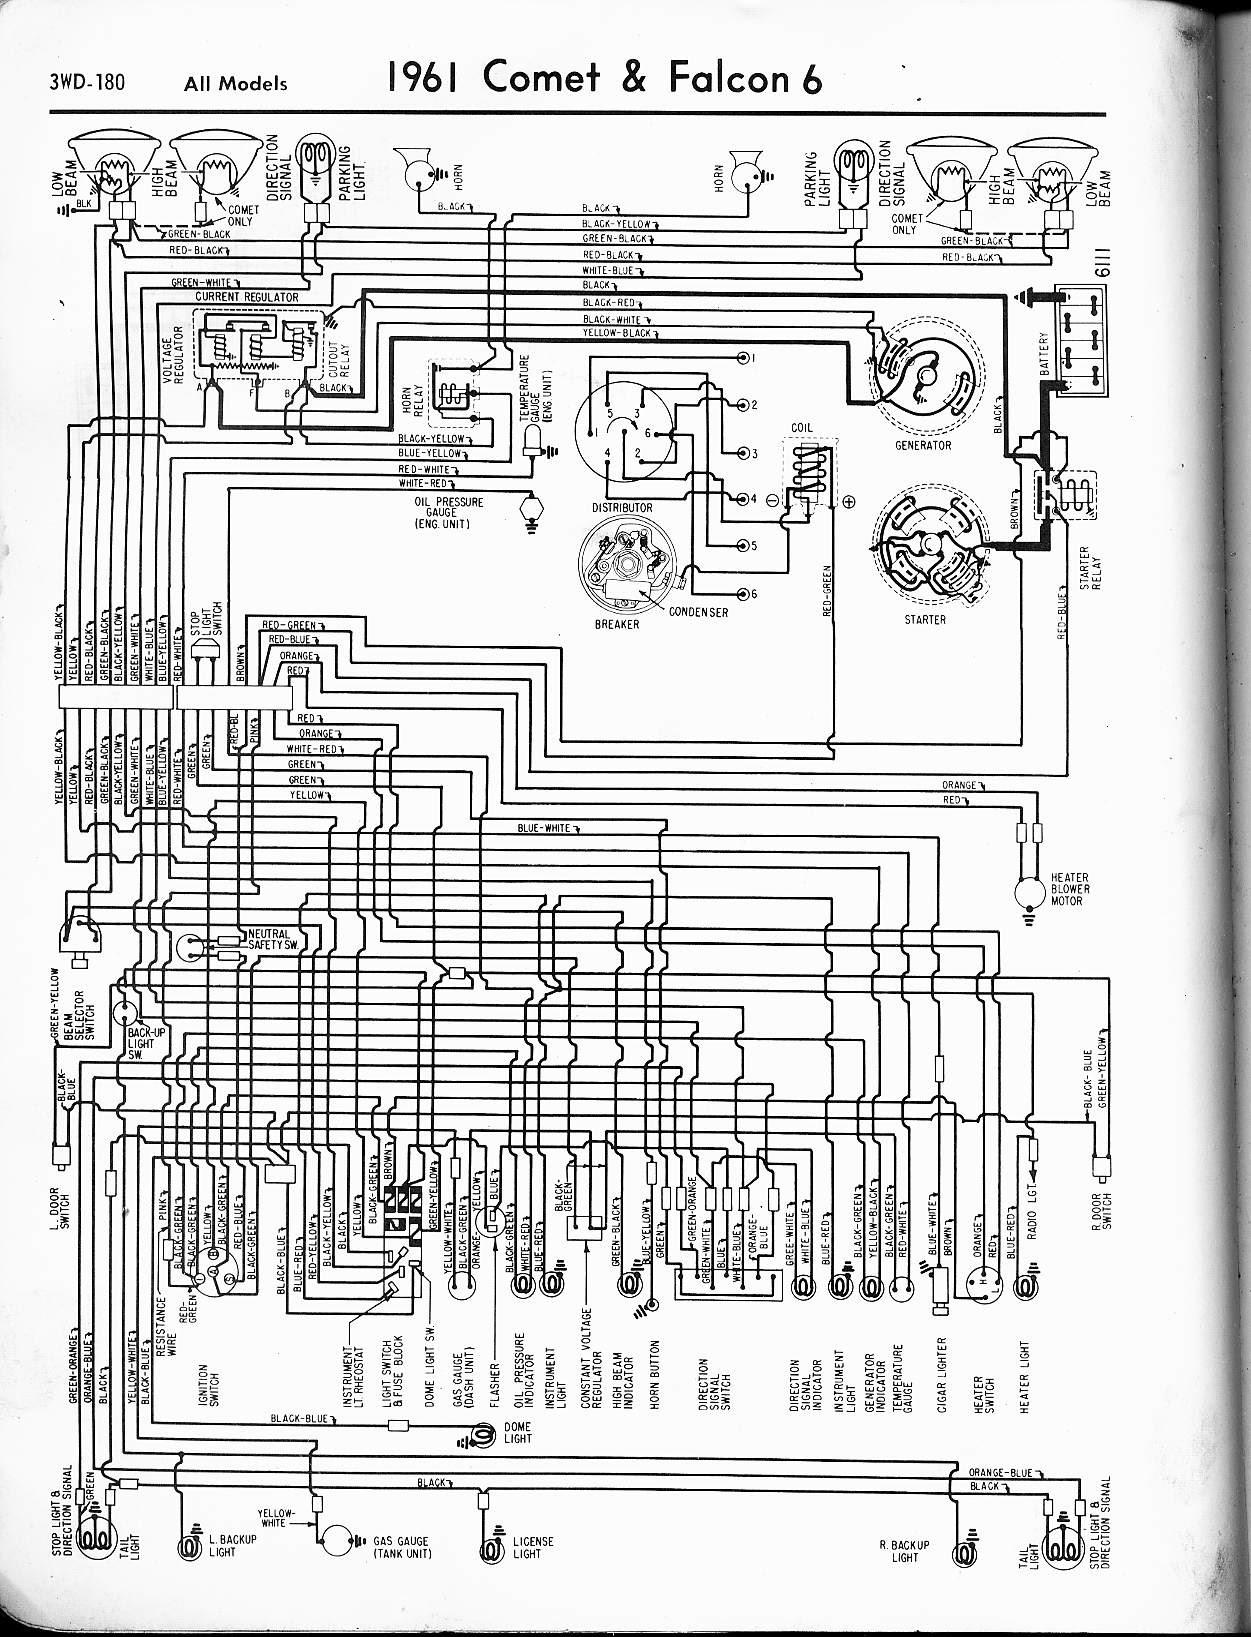 Diagram Ford Telstar Wiring Diagram Full Version Hd Quality Wiring Diagram Acewiring19 Newsetvlucera It